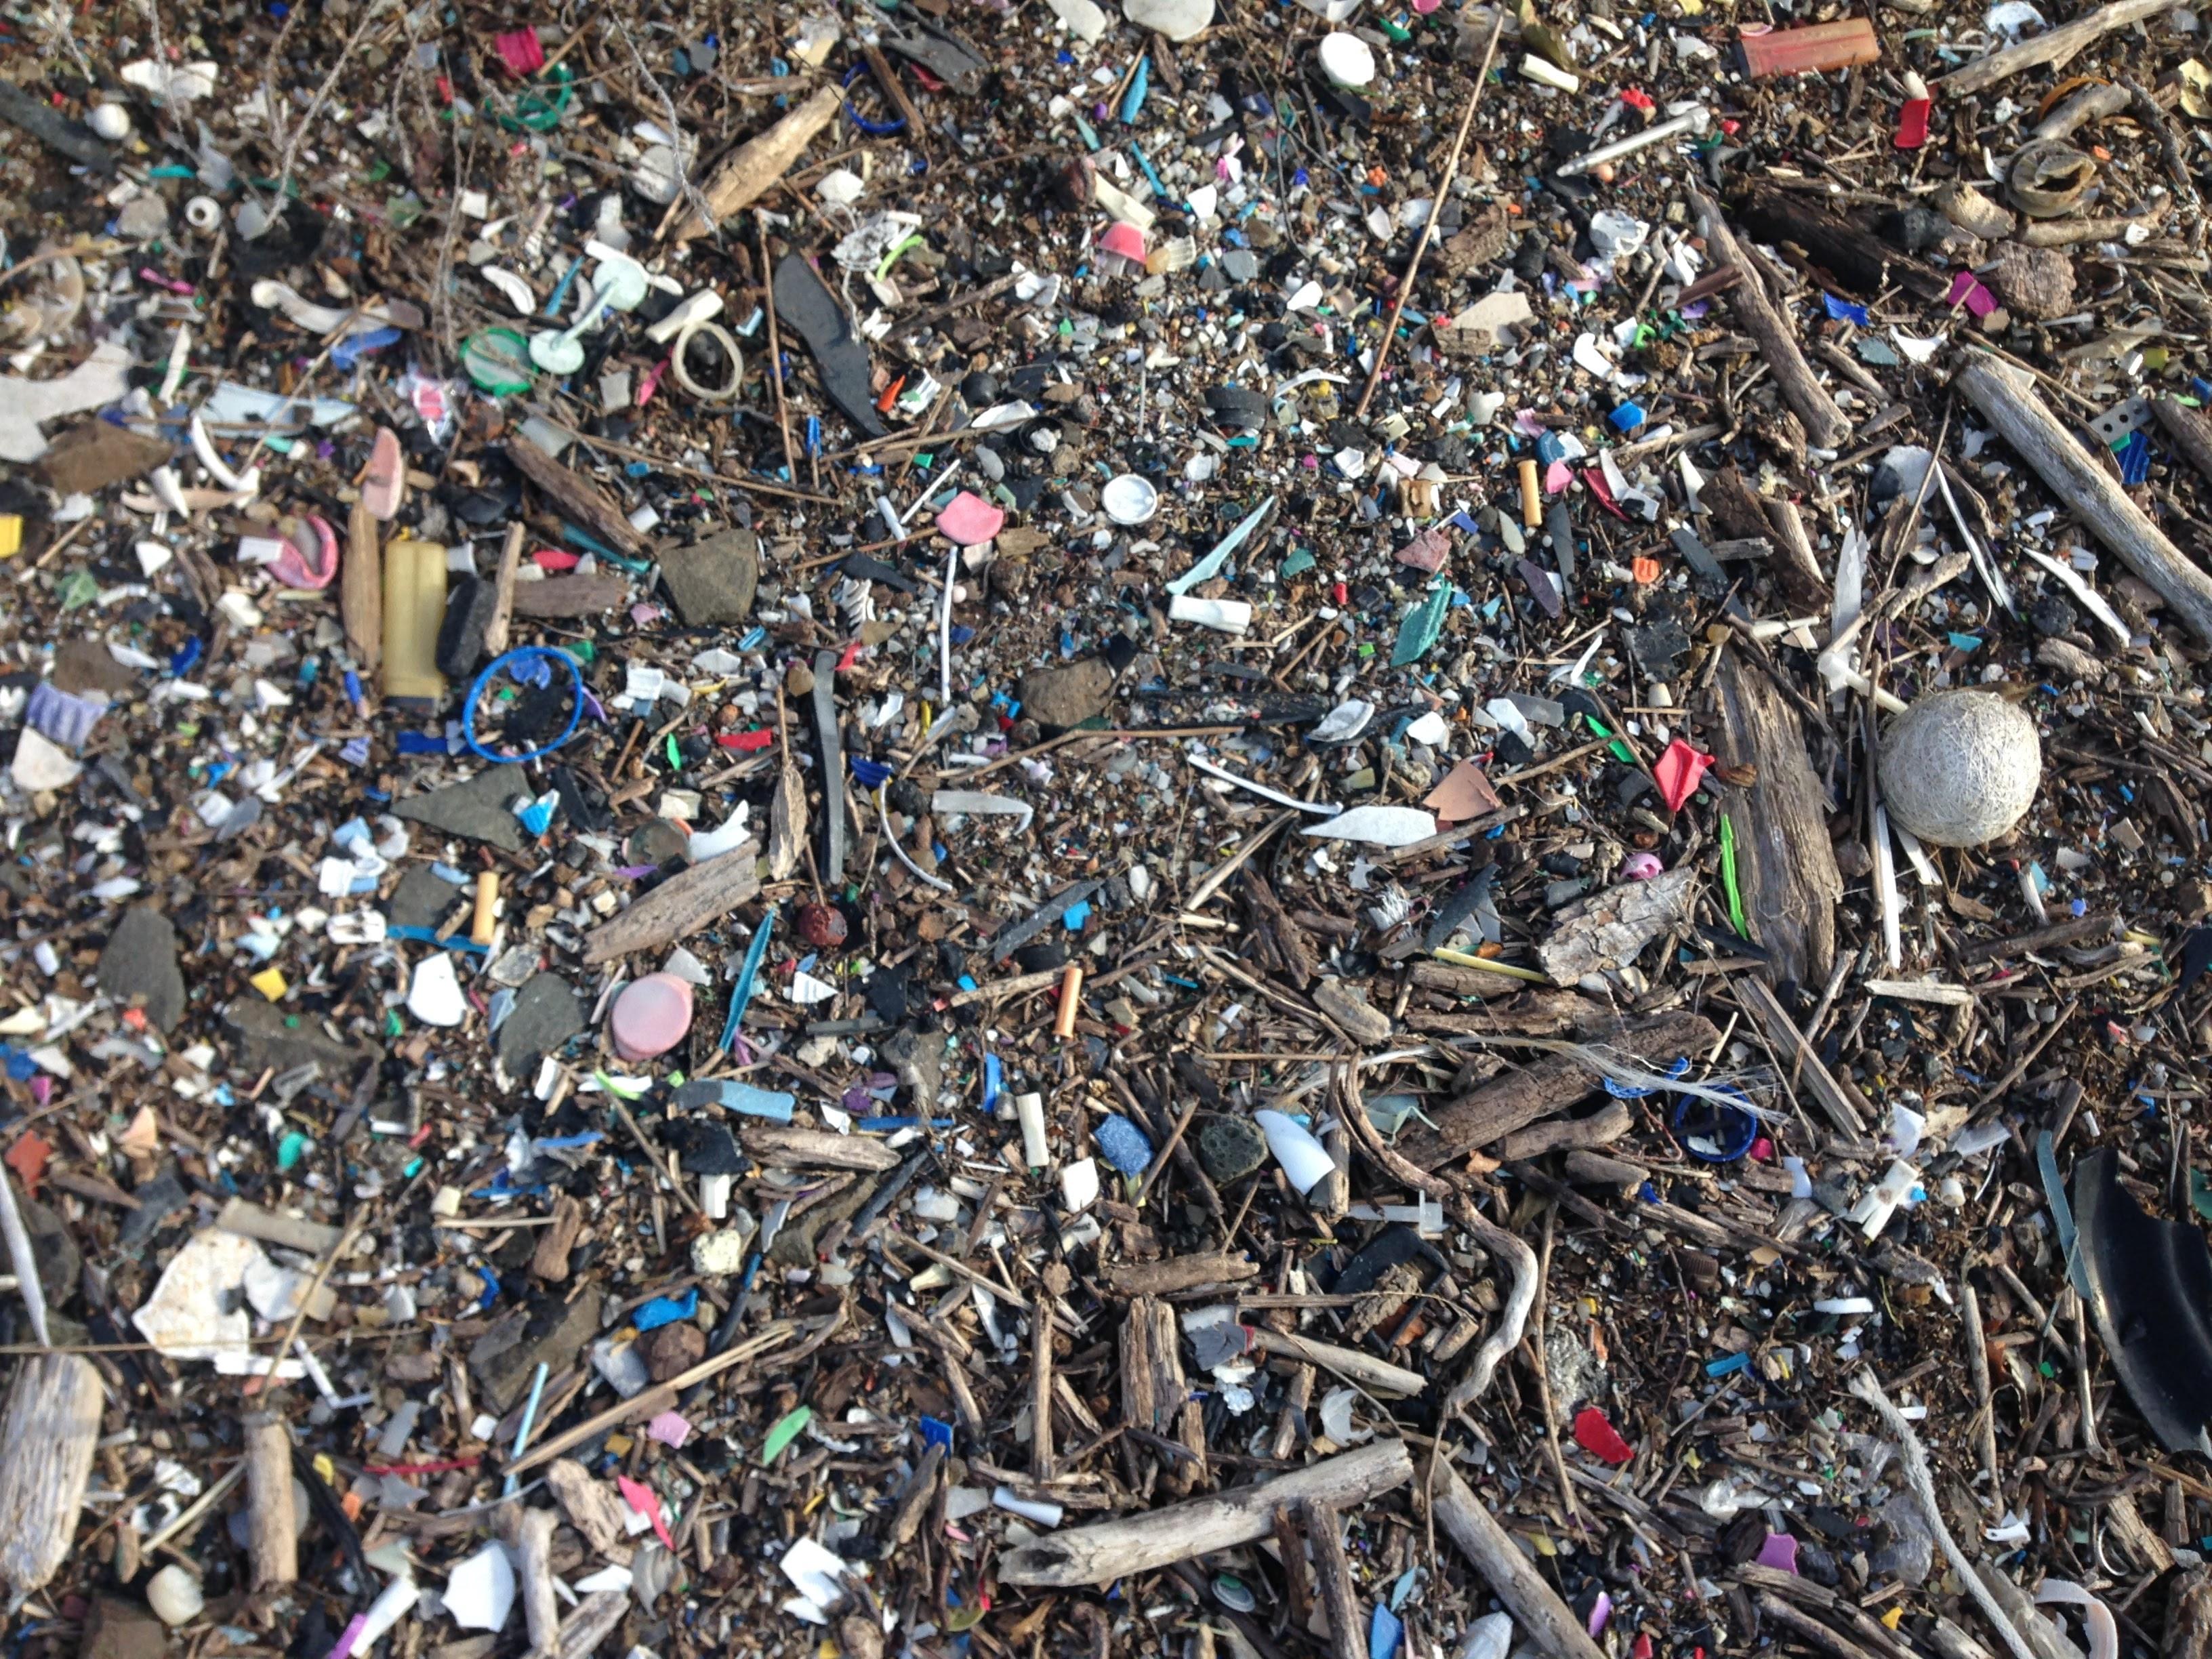 Plastic pollution and debris